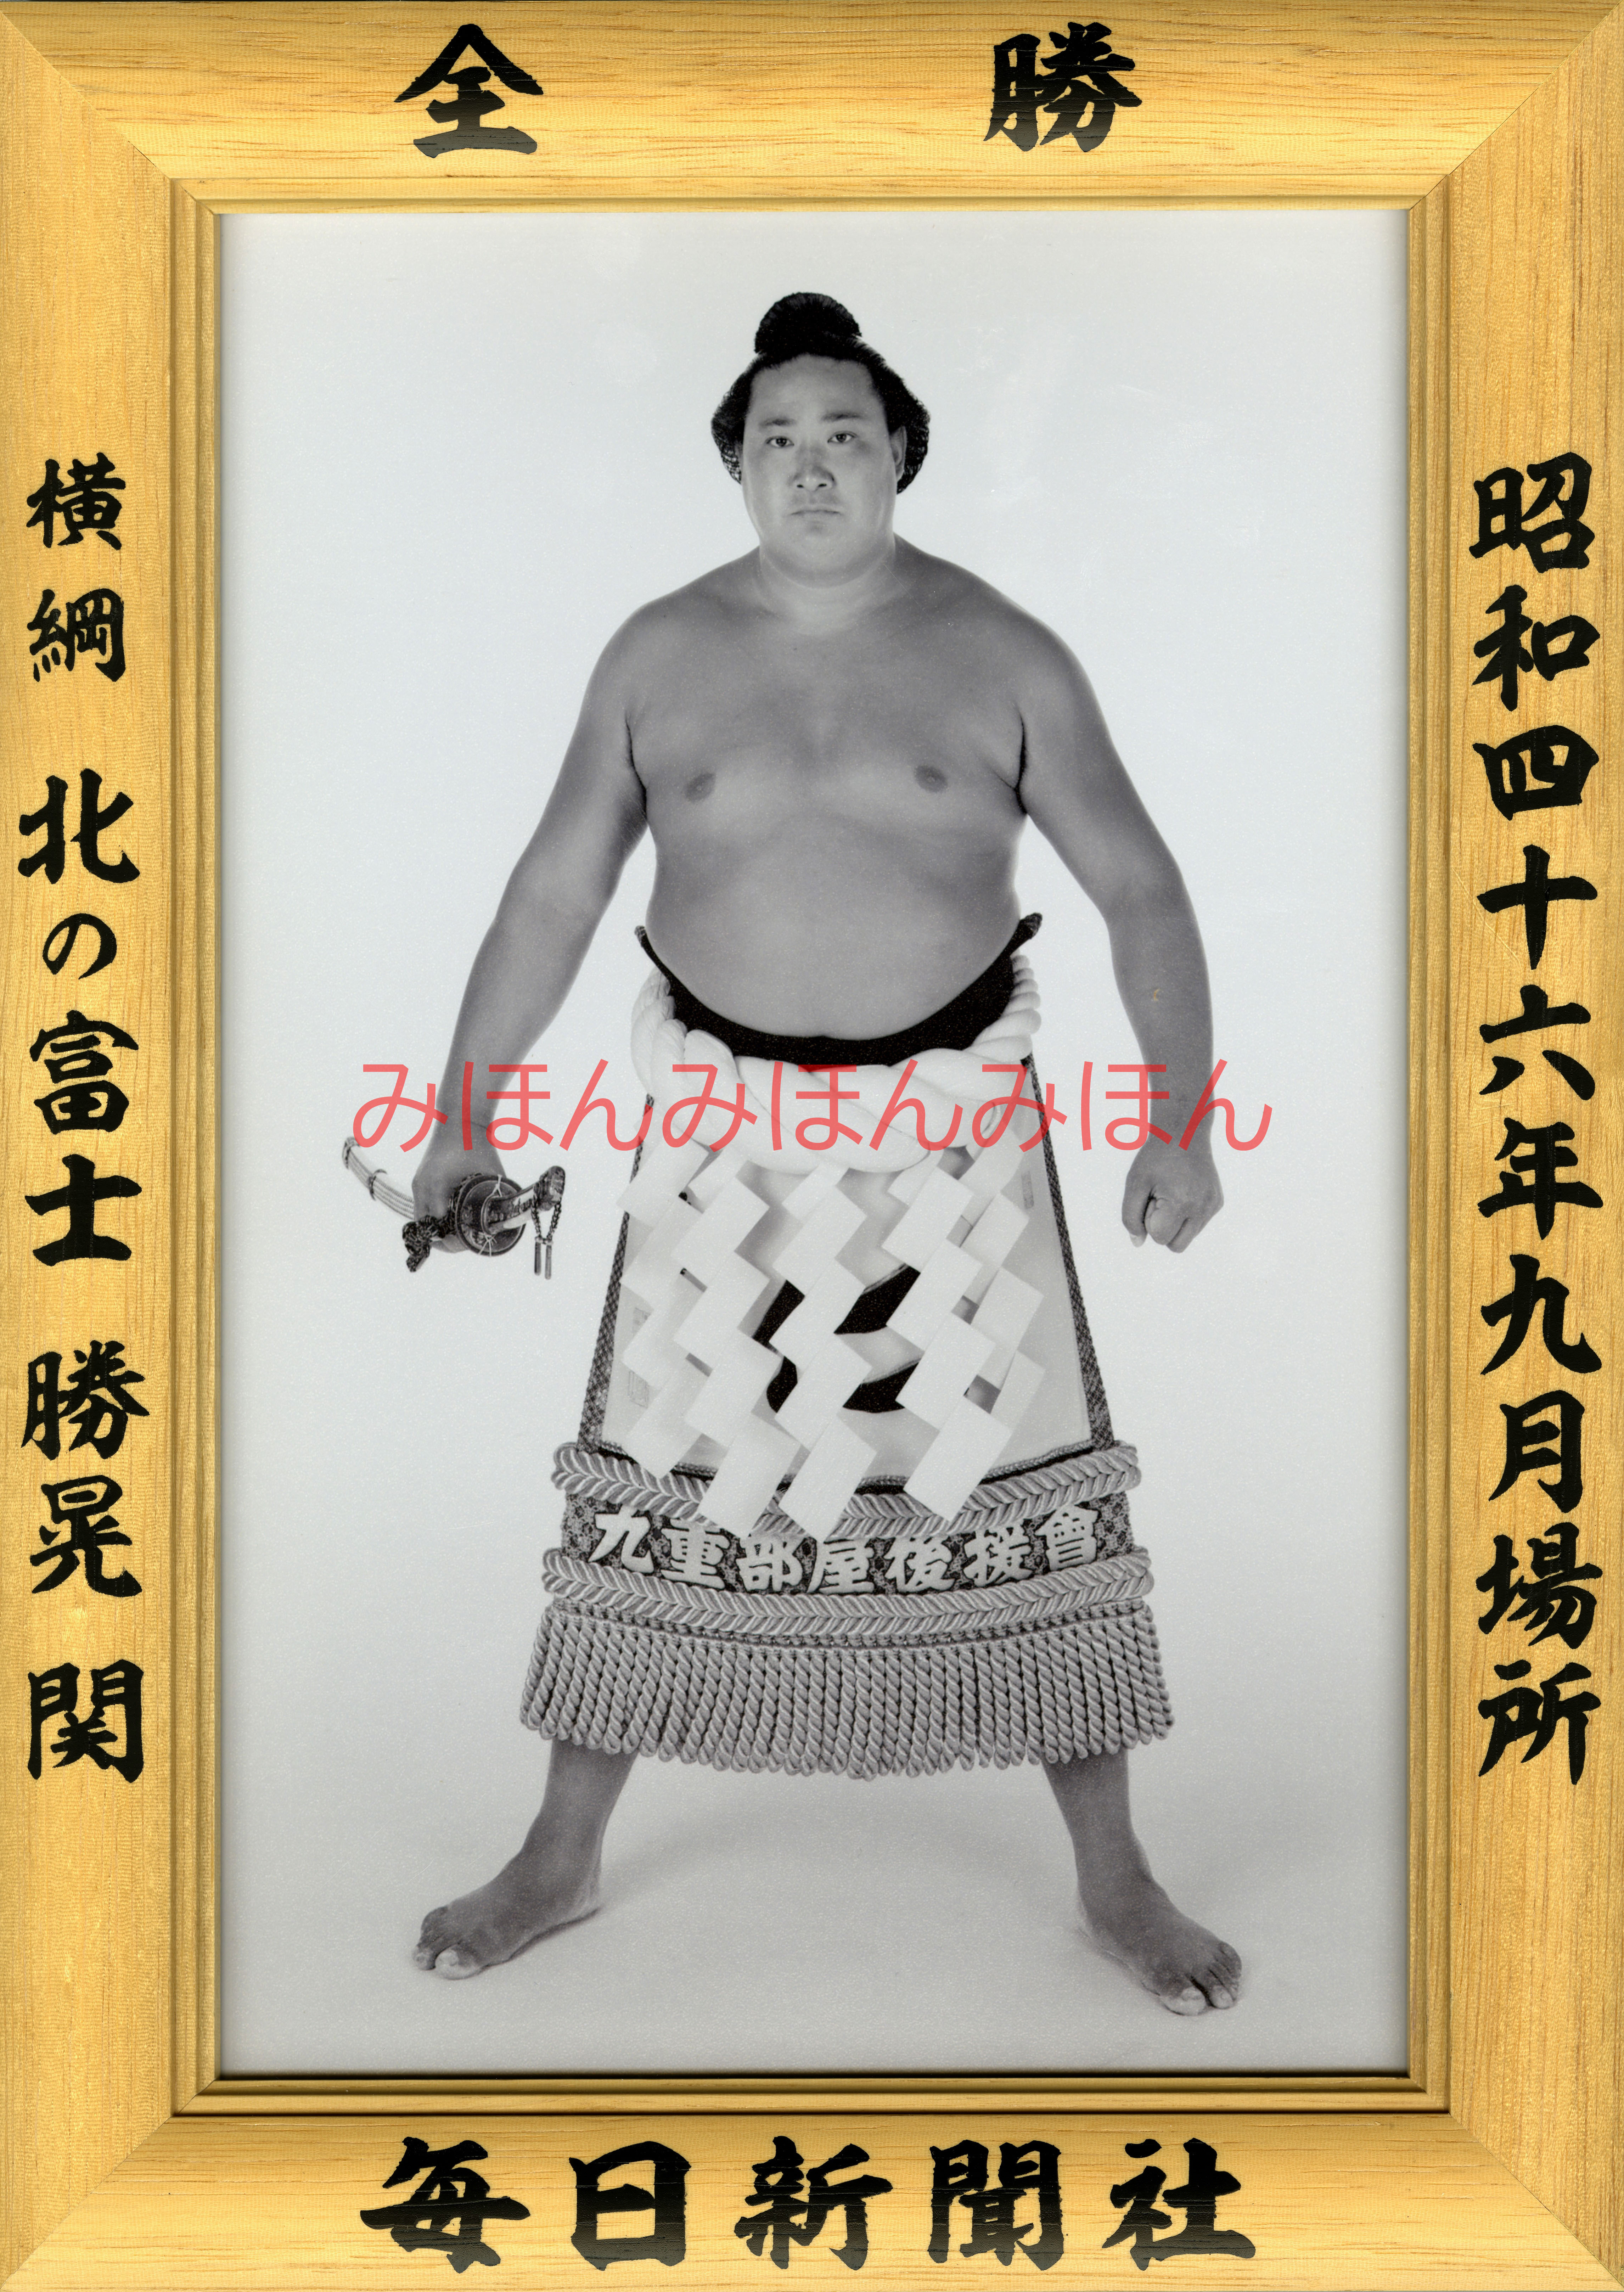 昭和46年9月場所全勝 横綱 北の富士勝晃関(7回目の優勝)